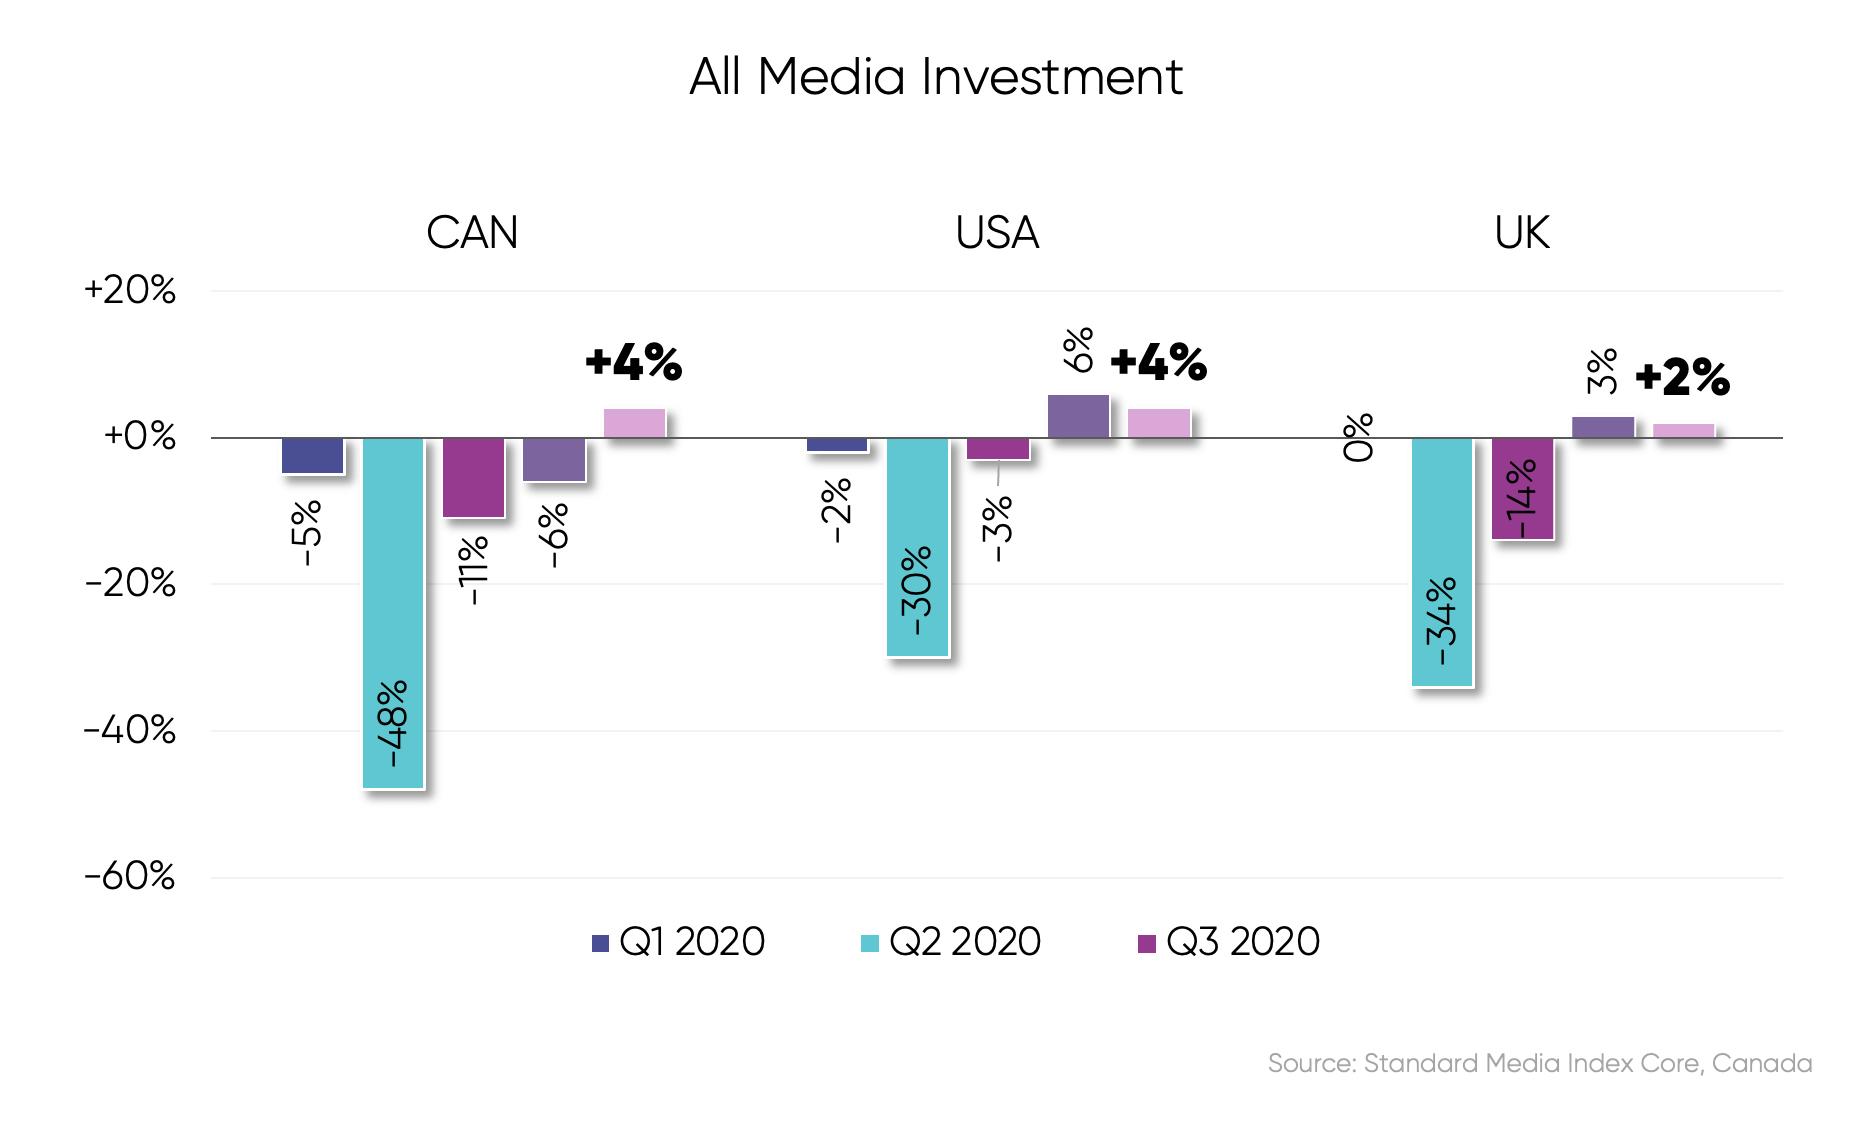 Canada All Media Investment graph SMI